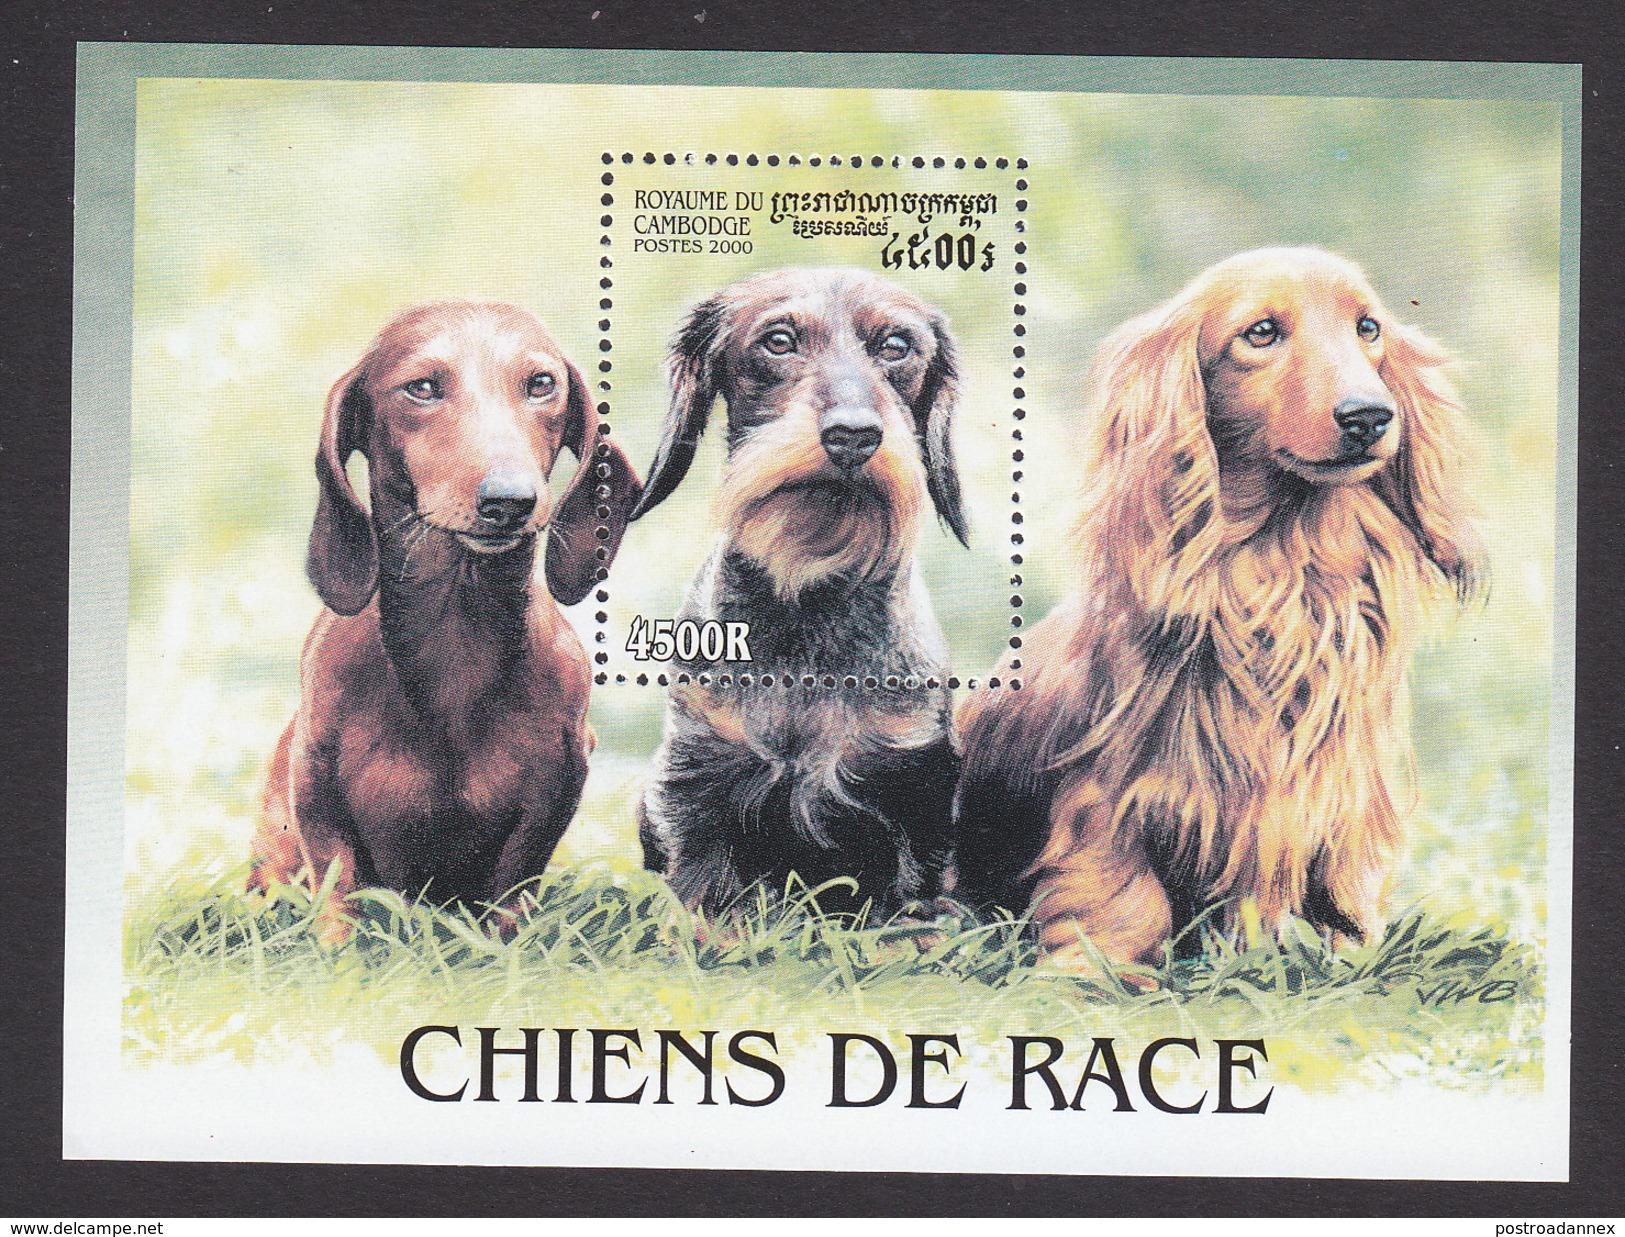 Cambodia, Scott #2023, Mint Hinged, Dogs, Issued 2000 - Cambodia